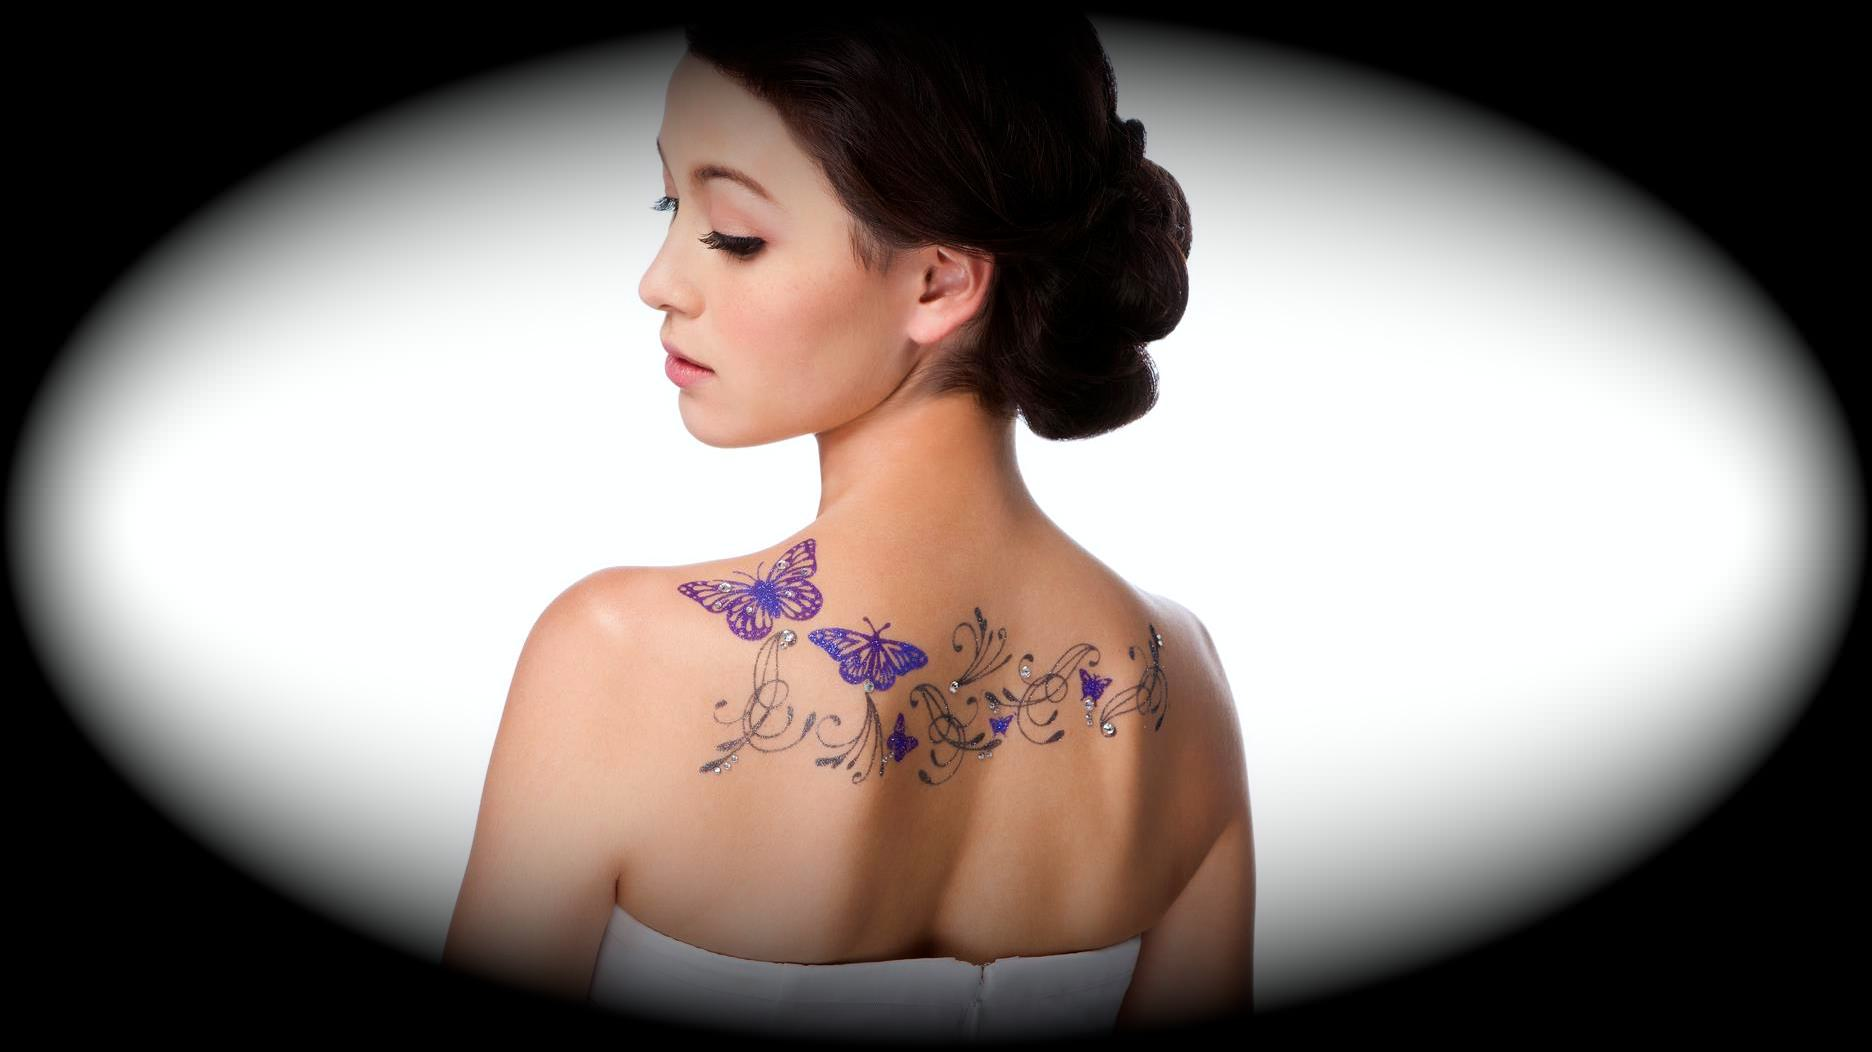 Body Art Tattoo Yuva Beauty La Grange Ilyuva Beauty